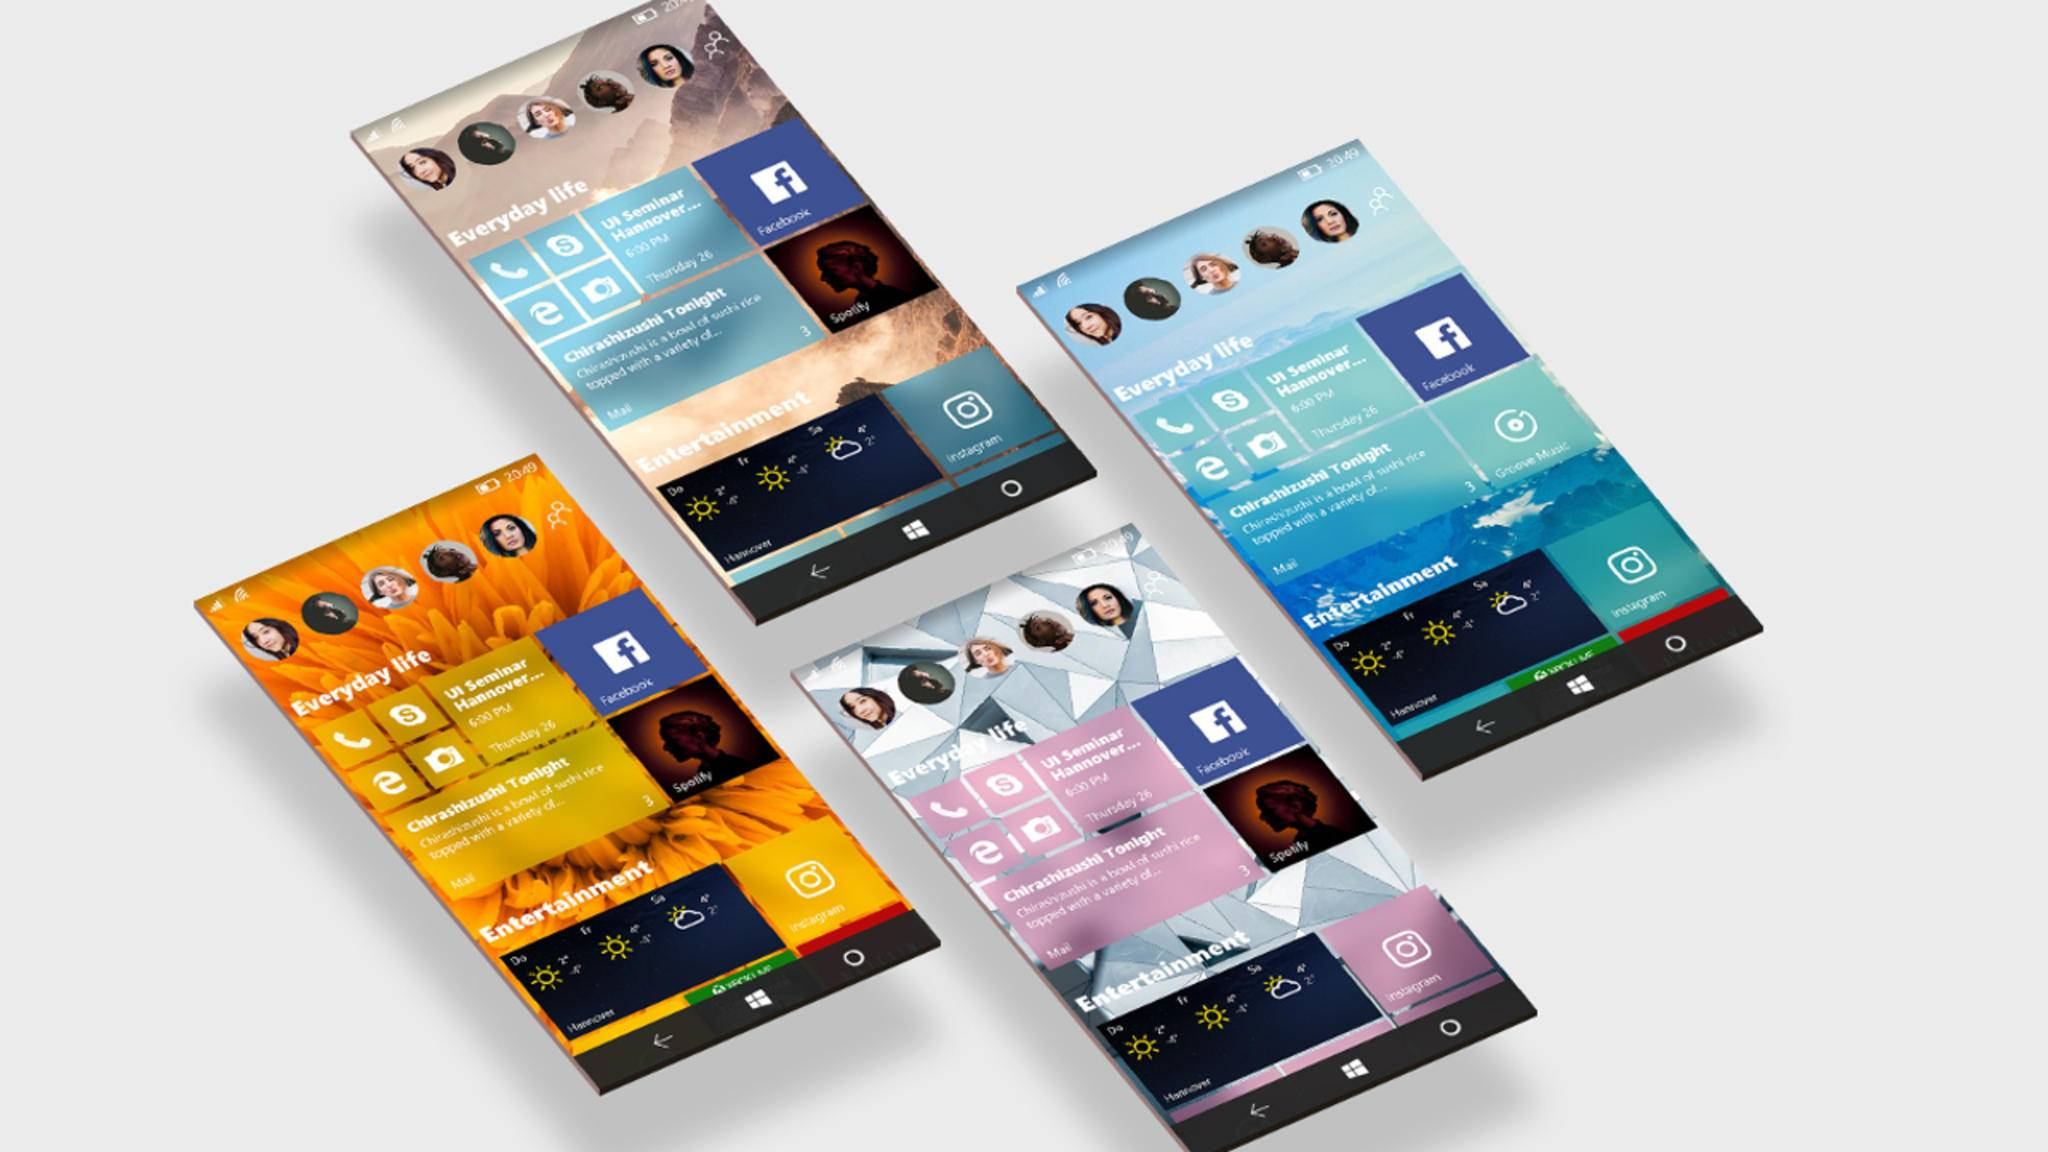 Windows-10-adaptiv-Konzept